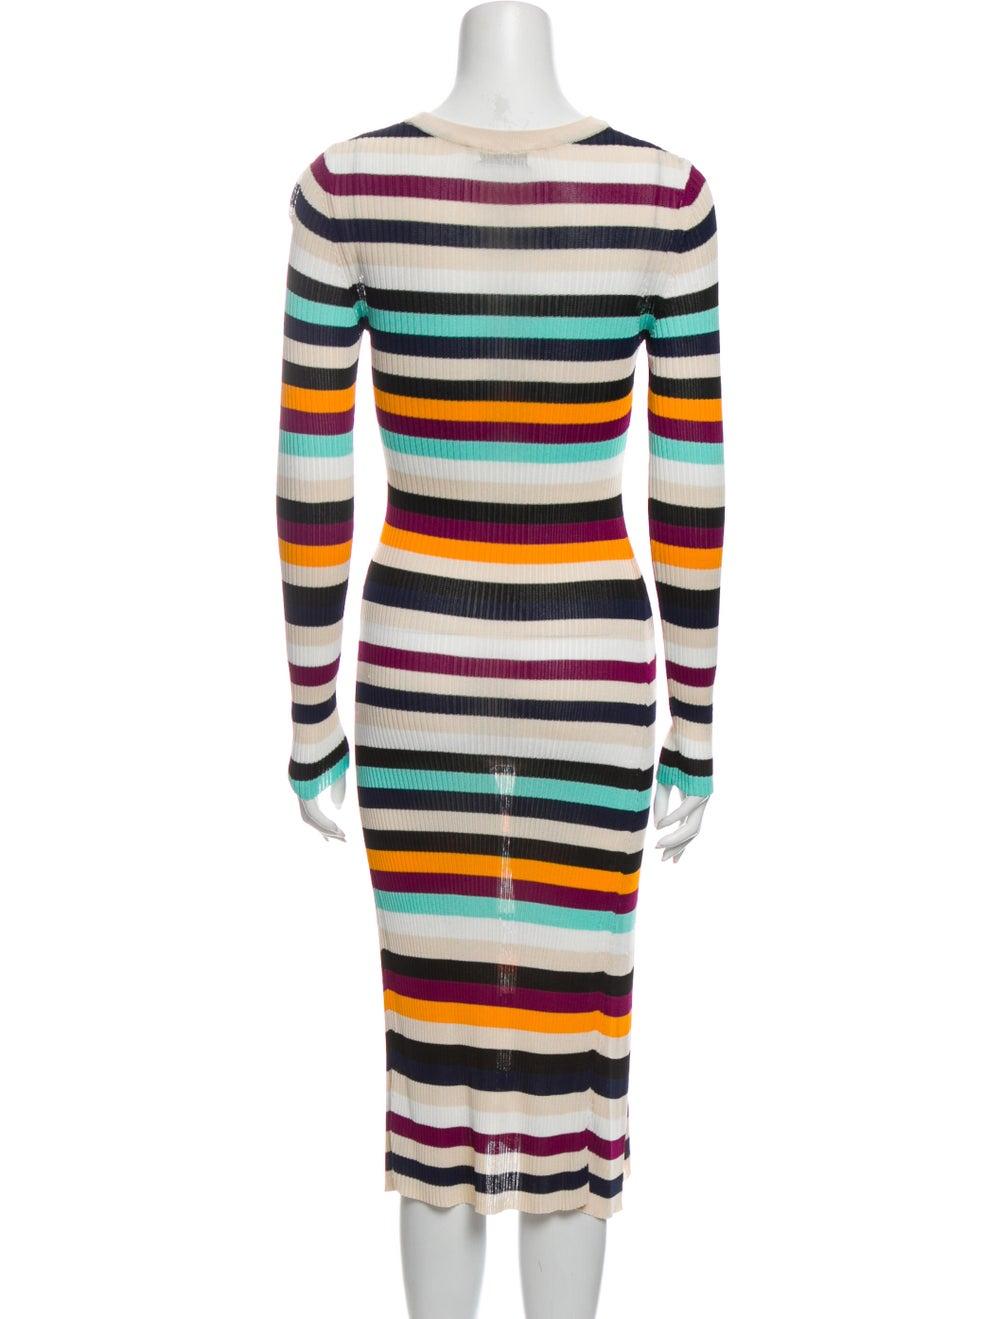 Altuzarra Striped Midi Length Dress - image 3